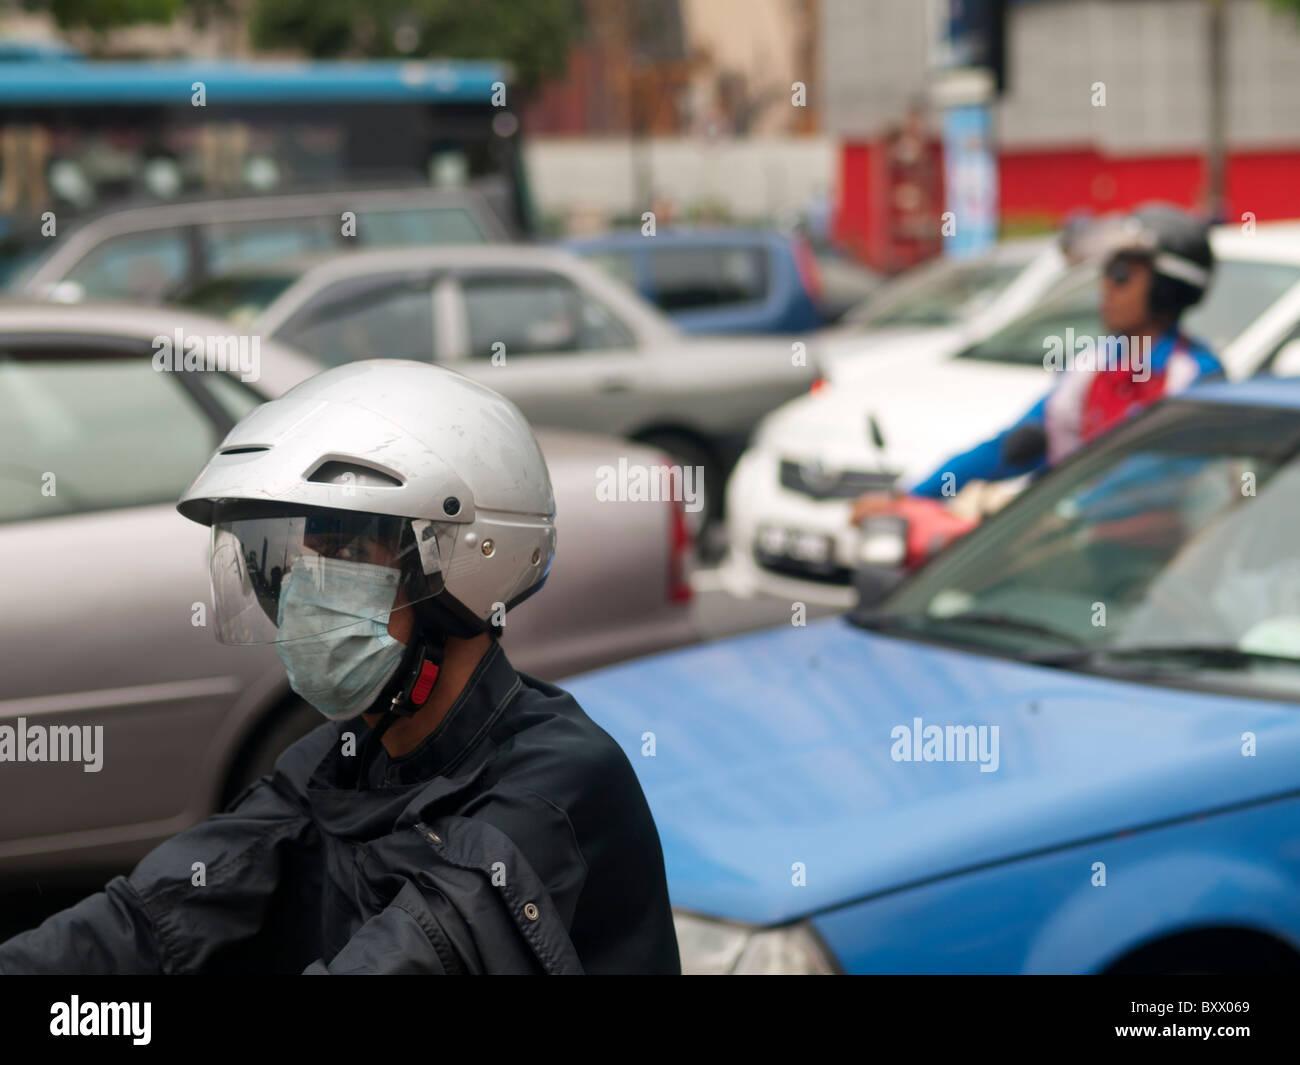 Kuala Lumpur traffic jam - Stock Image